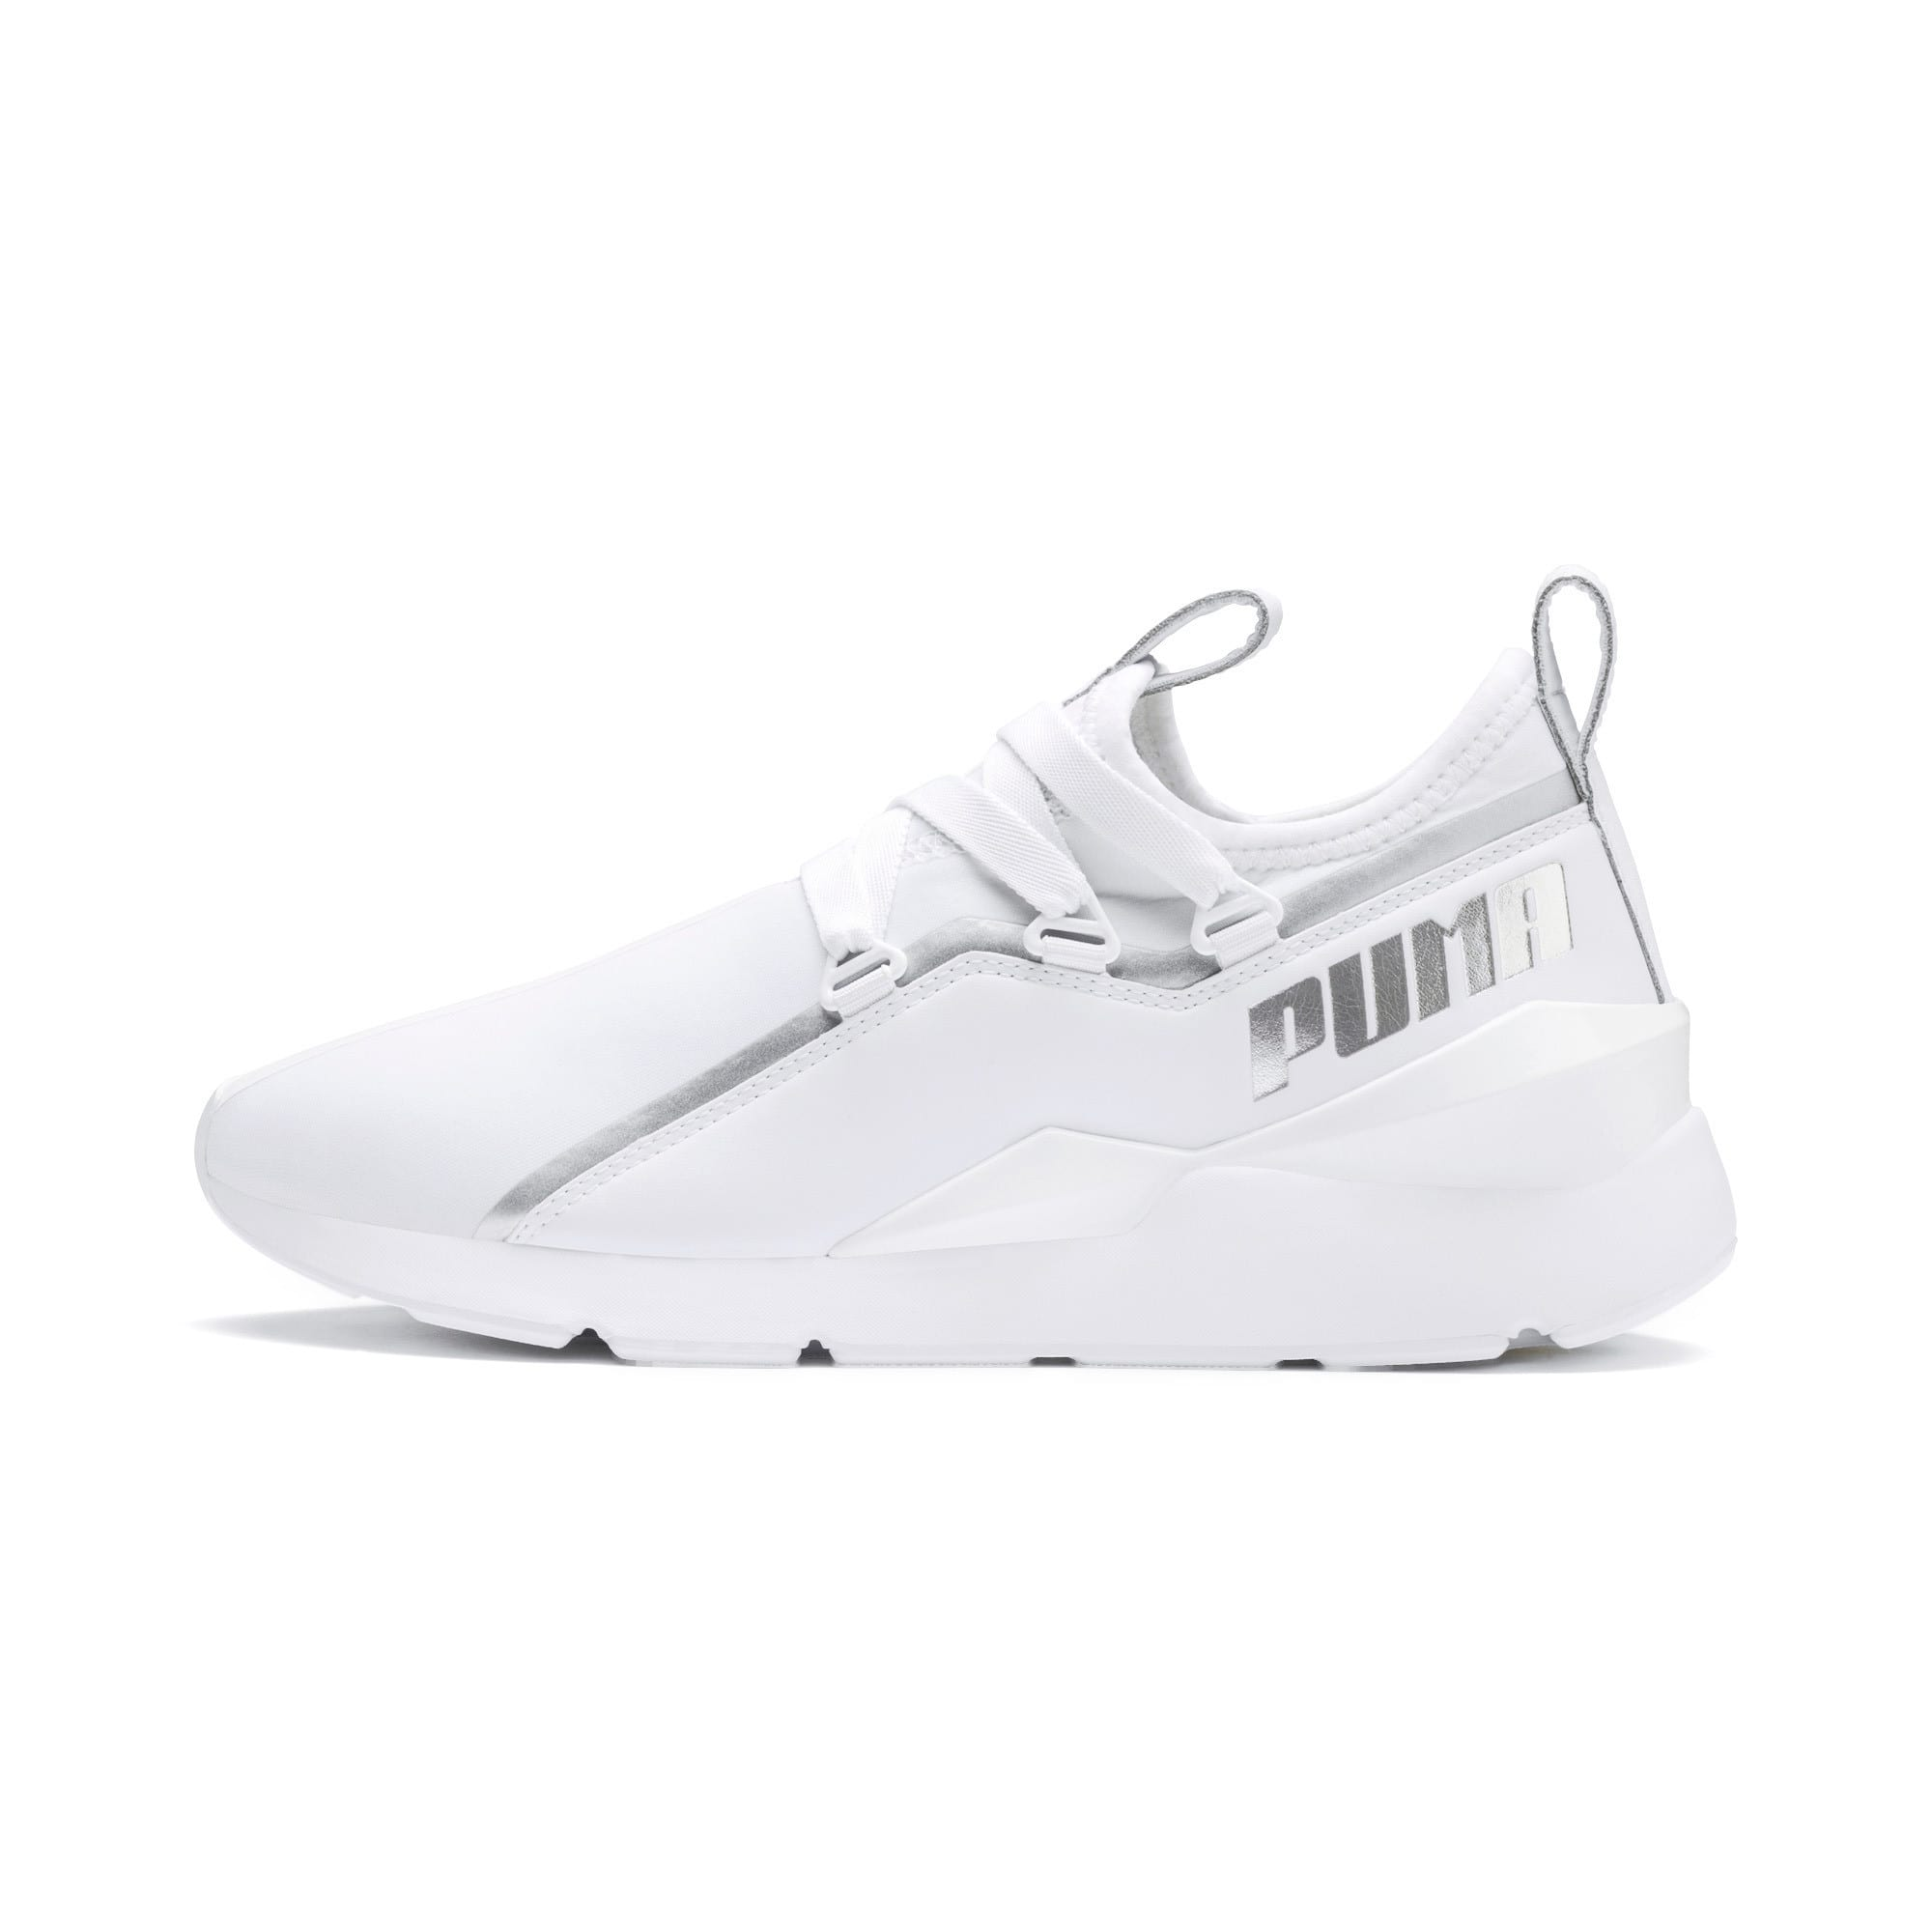 Thumbnail 1 of Muse 2 Trailblazer Women's Sneakers, Puma White-Puma Silver, medium